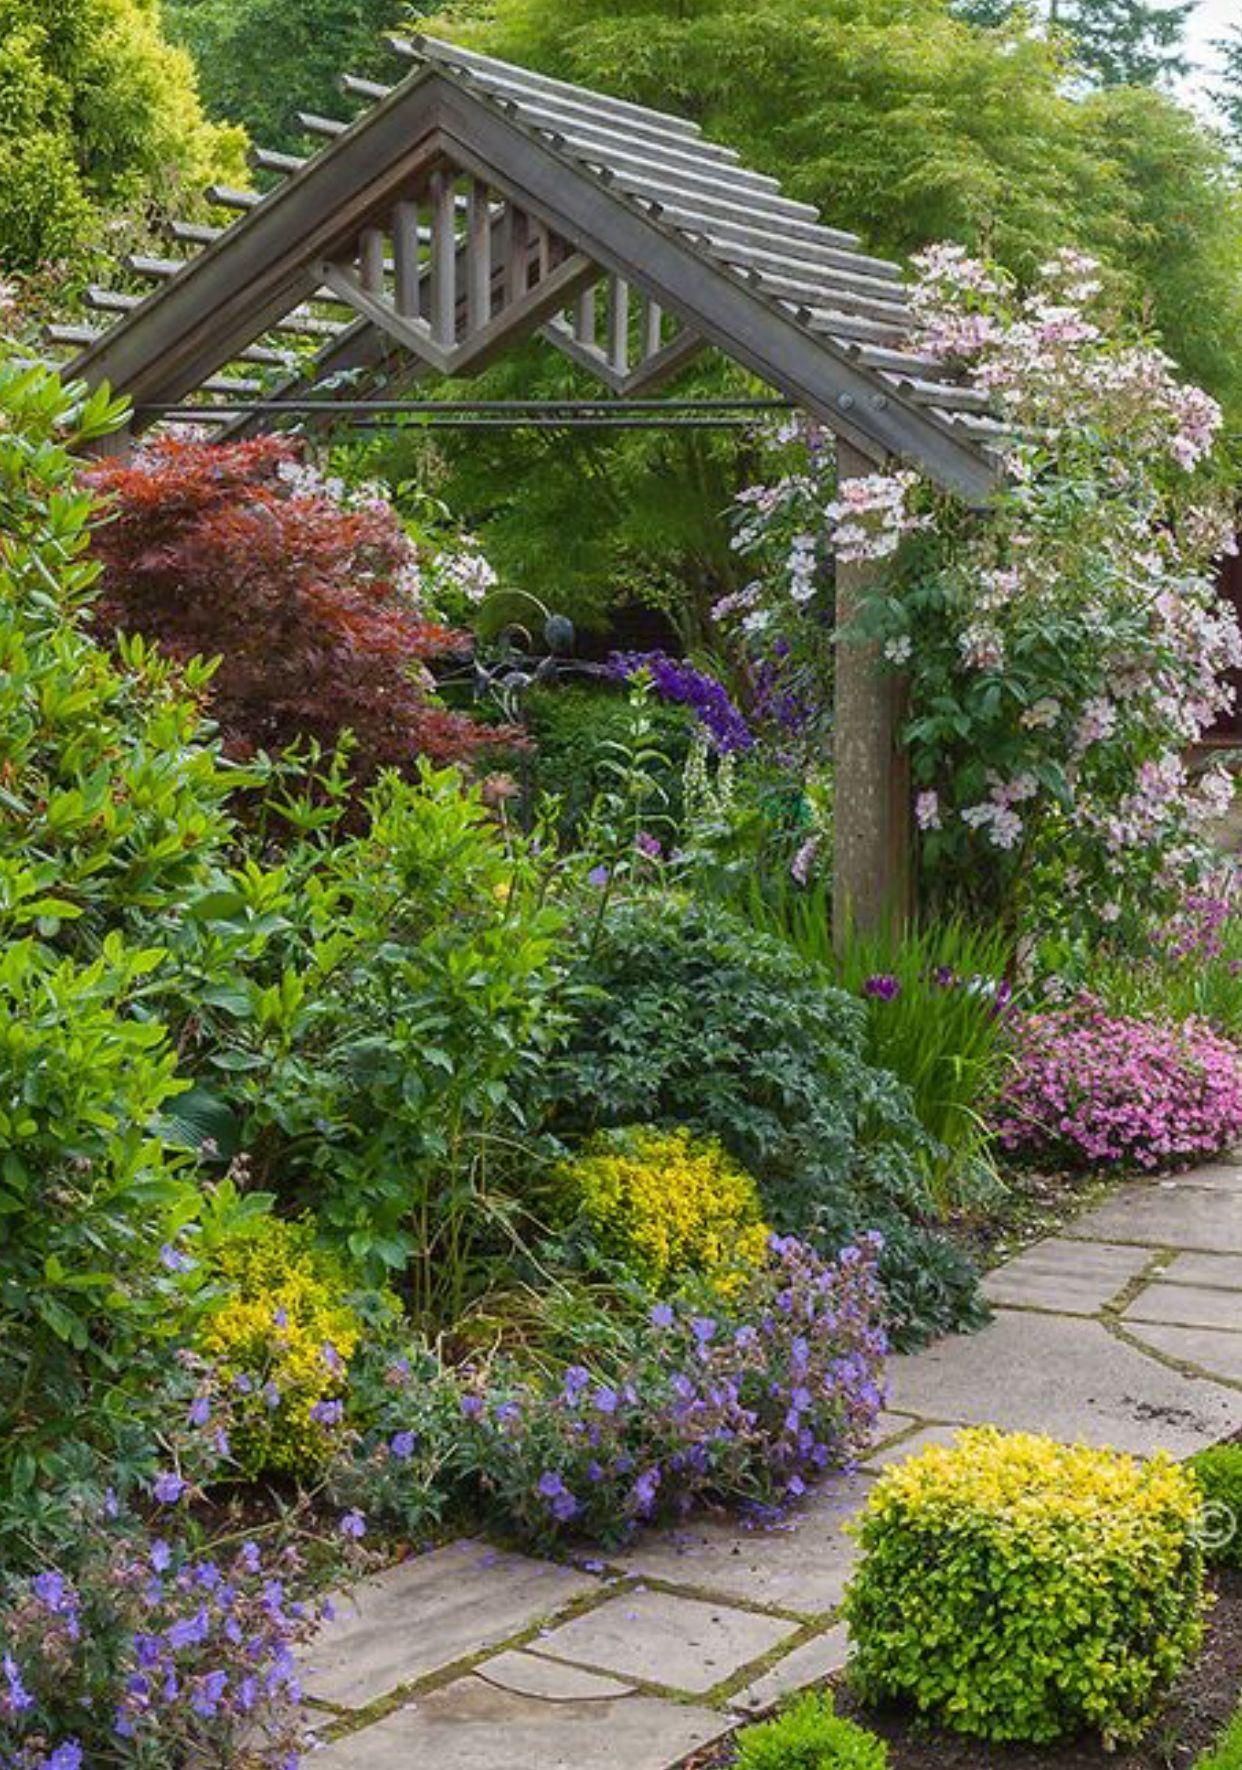 17 First Rate Berry Garden Layout Ideas Outdoor Herb Garden Dream Backyard Garden Outdoor Gardens